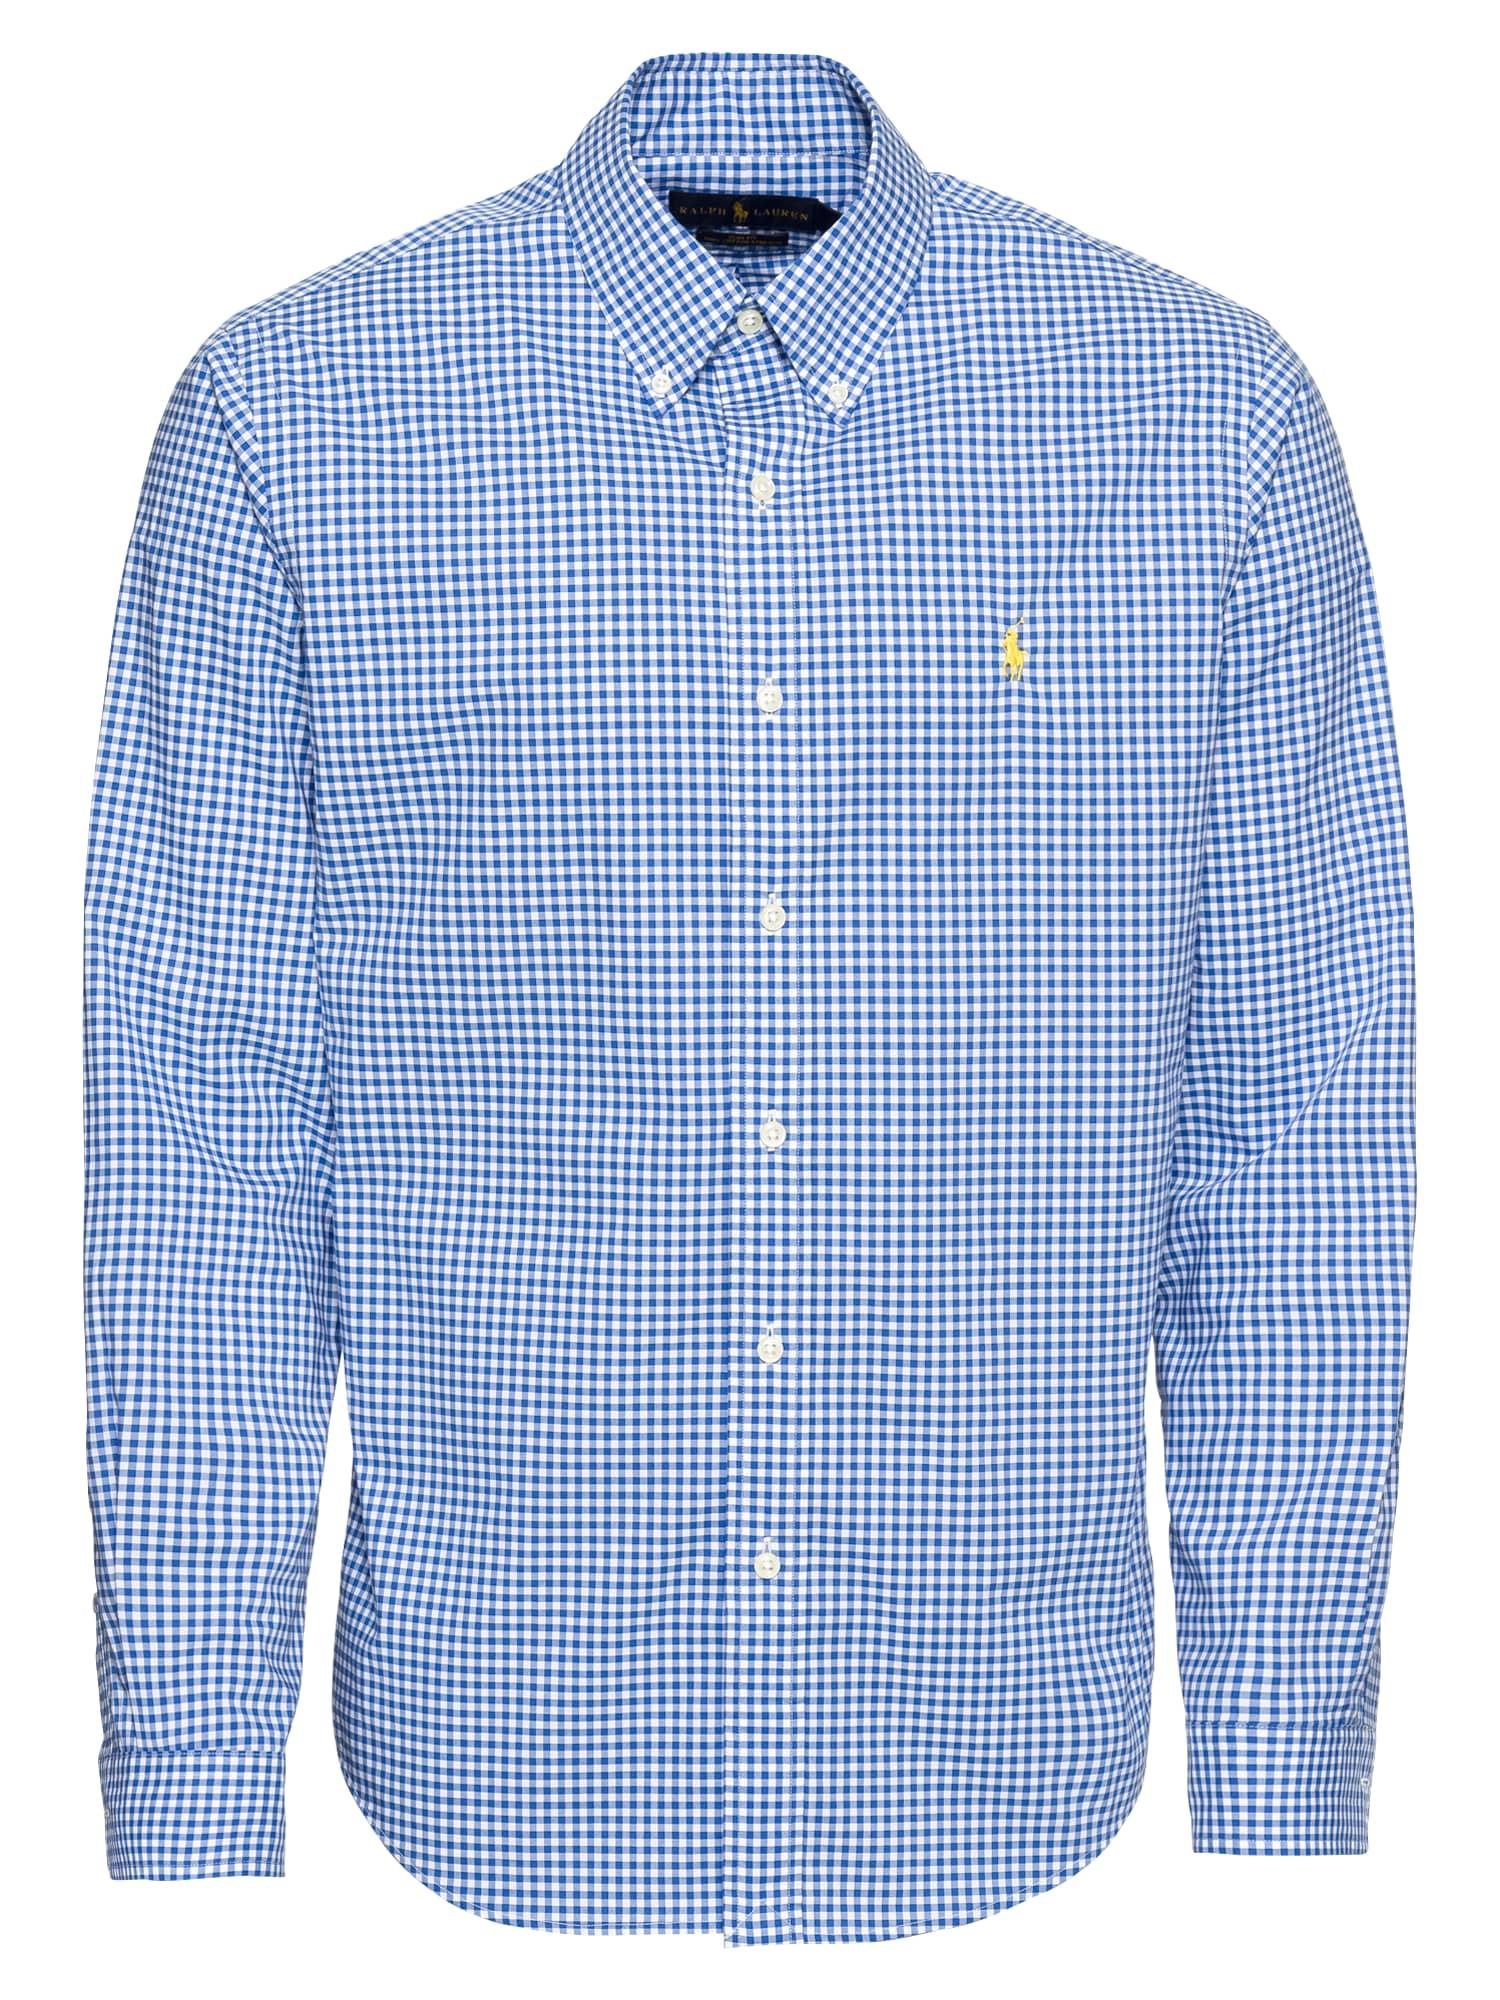 Košile SL BD PPCSPT-LONG SLEEVE-SPORT SHIRT modrá bílá POLO RALPH LAUREN